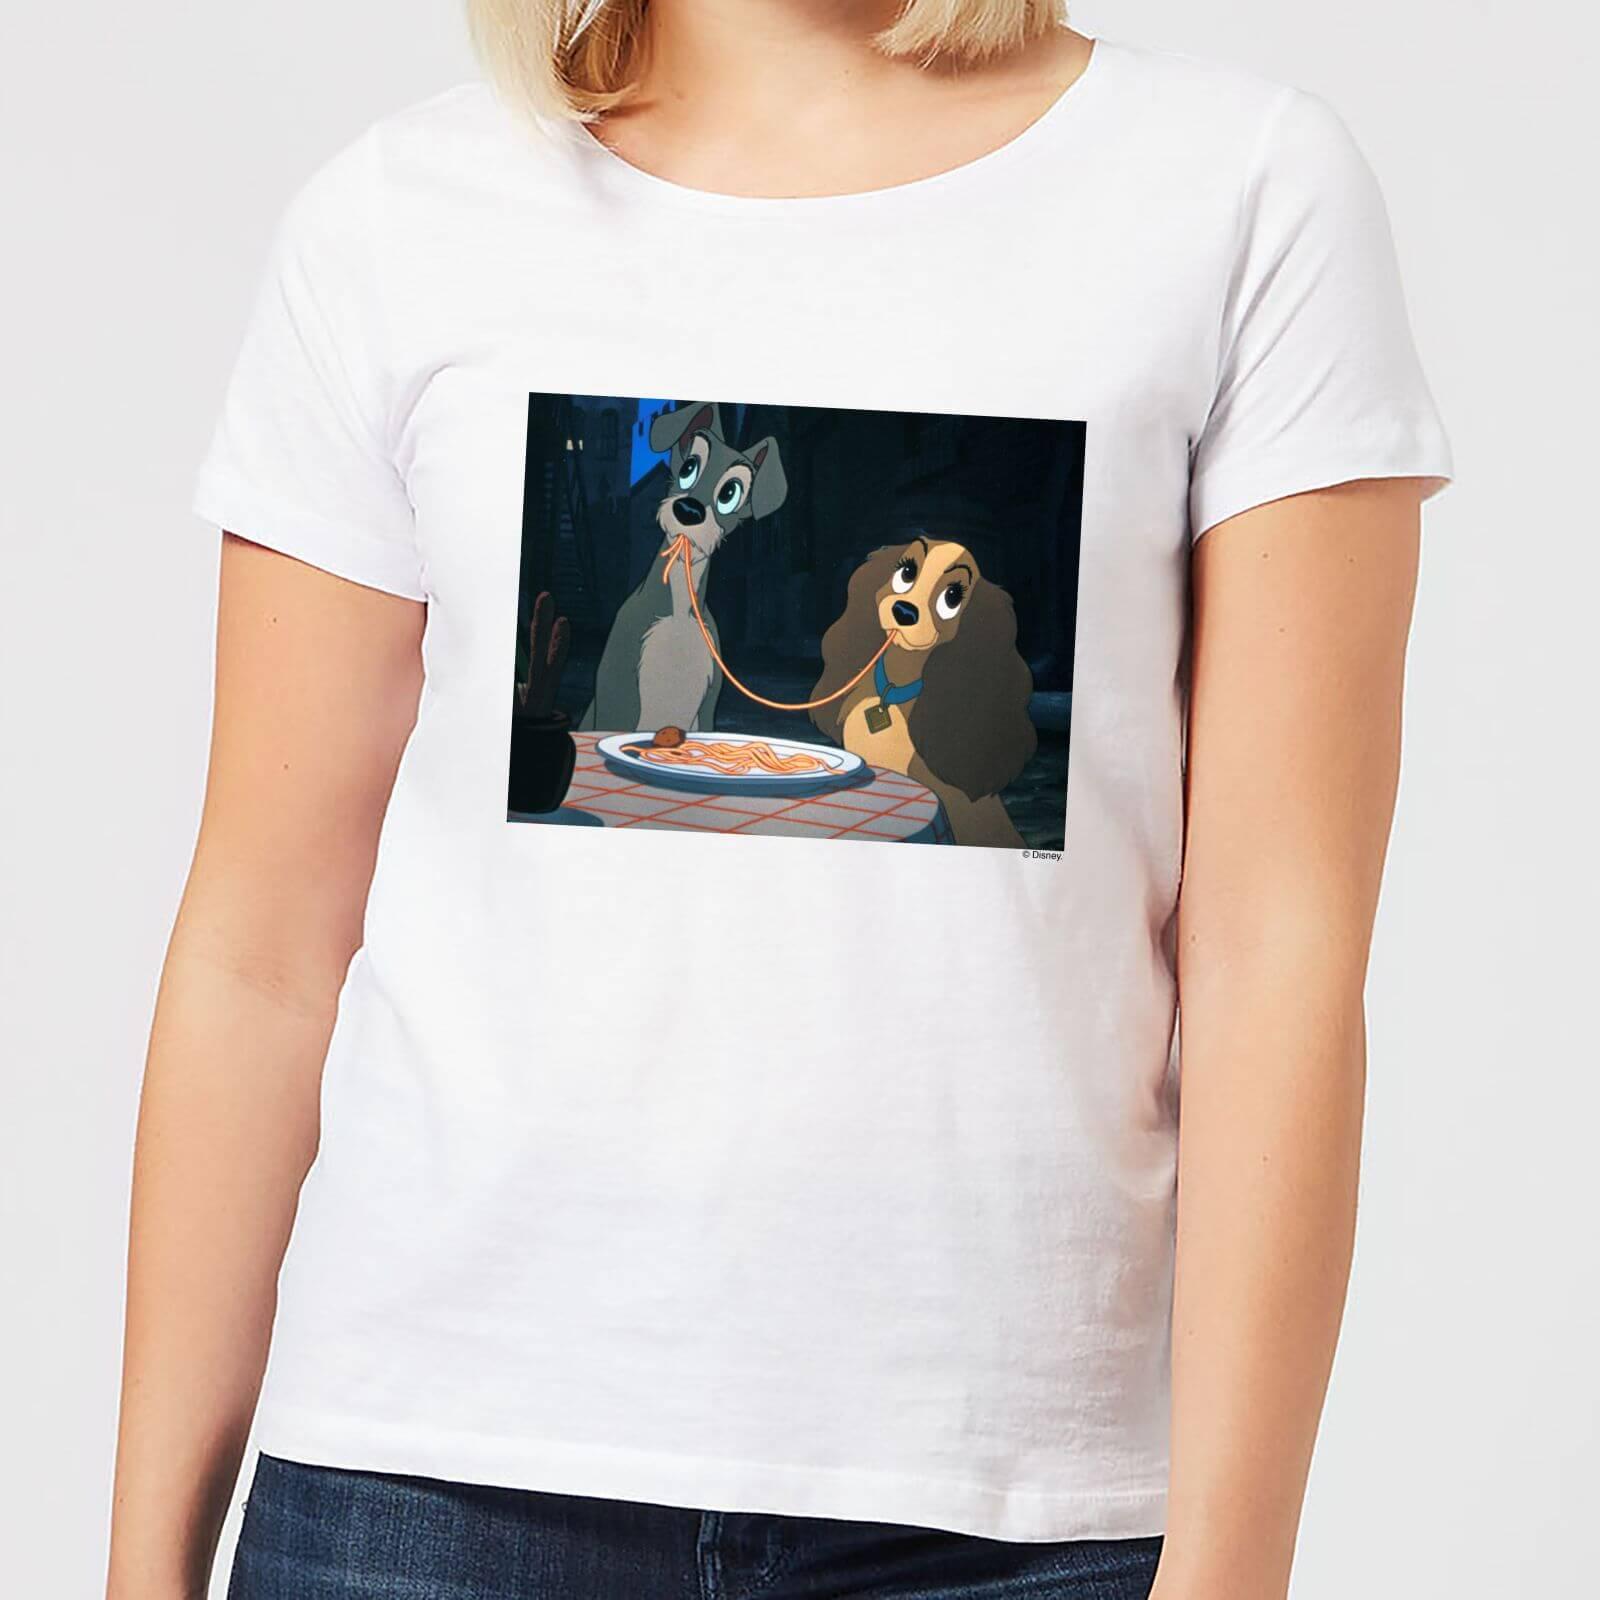 Disney Disney Lady And The Tramp Spaghetti Scene Women's T-Shirt - White - 5XL - White